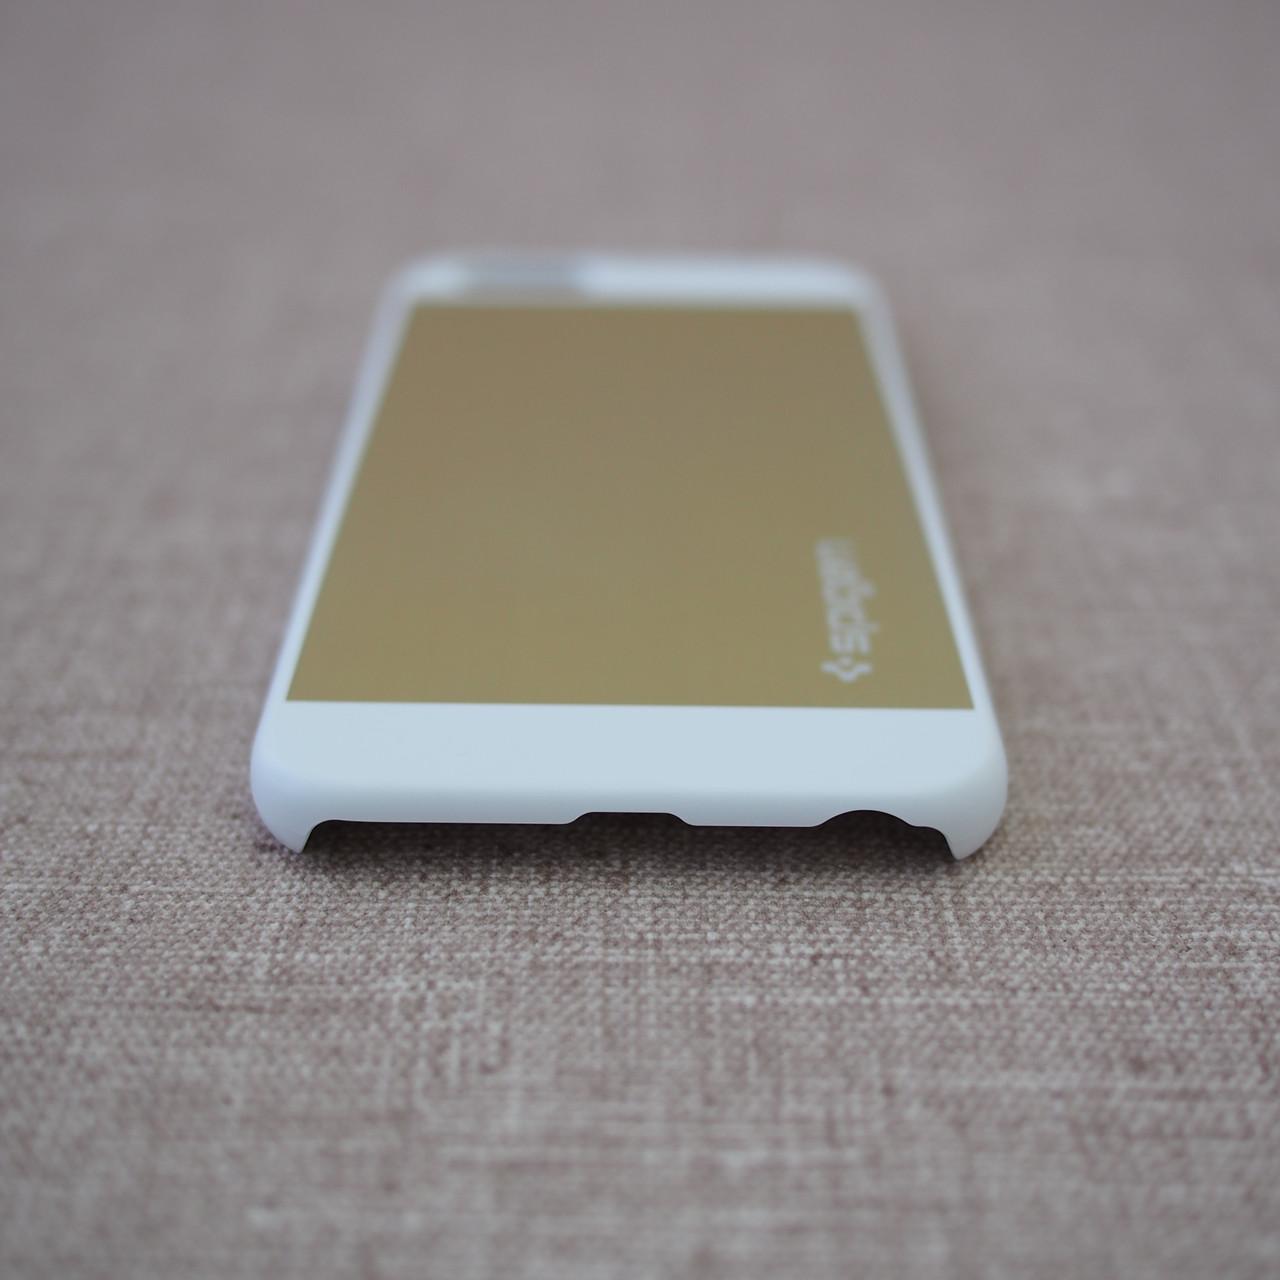 Spigen Aluminum Fit iPhone 6 champagne gold Для телефона